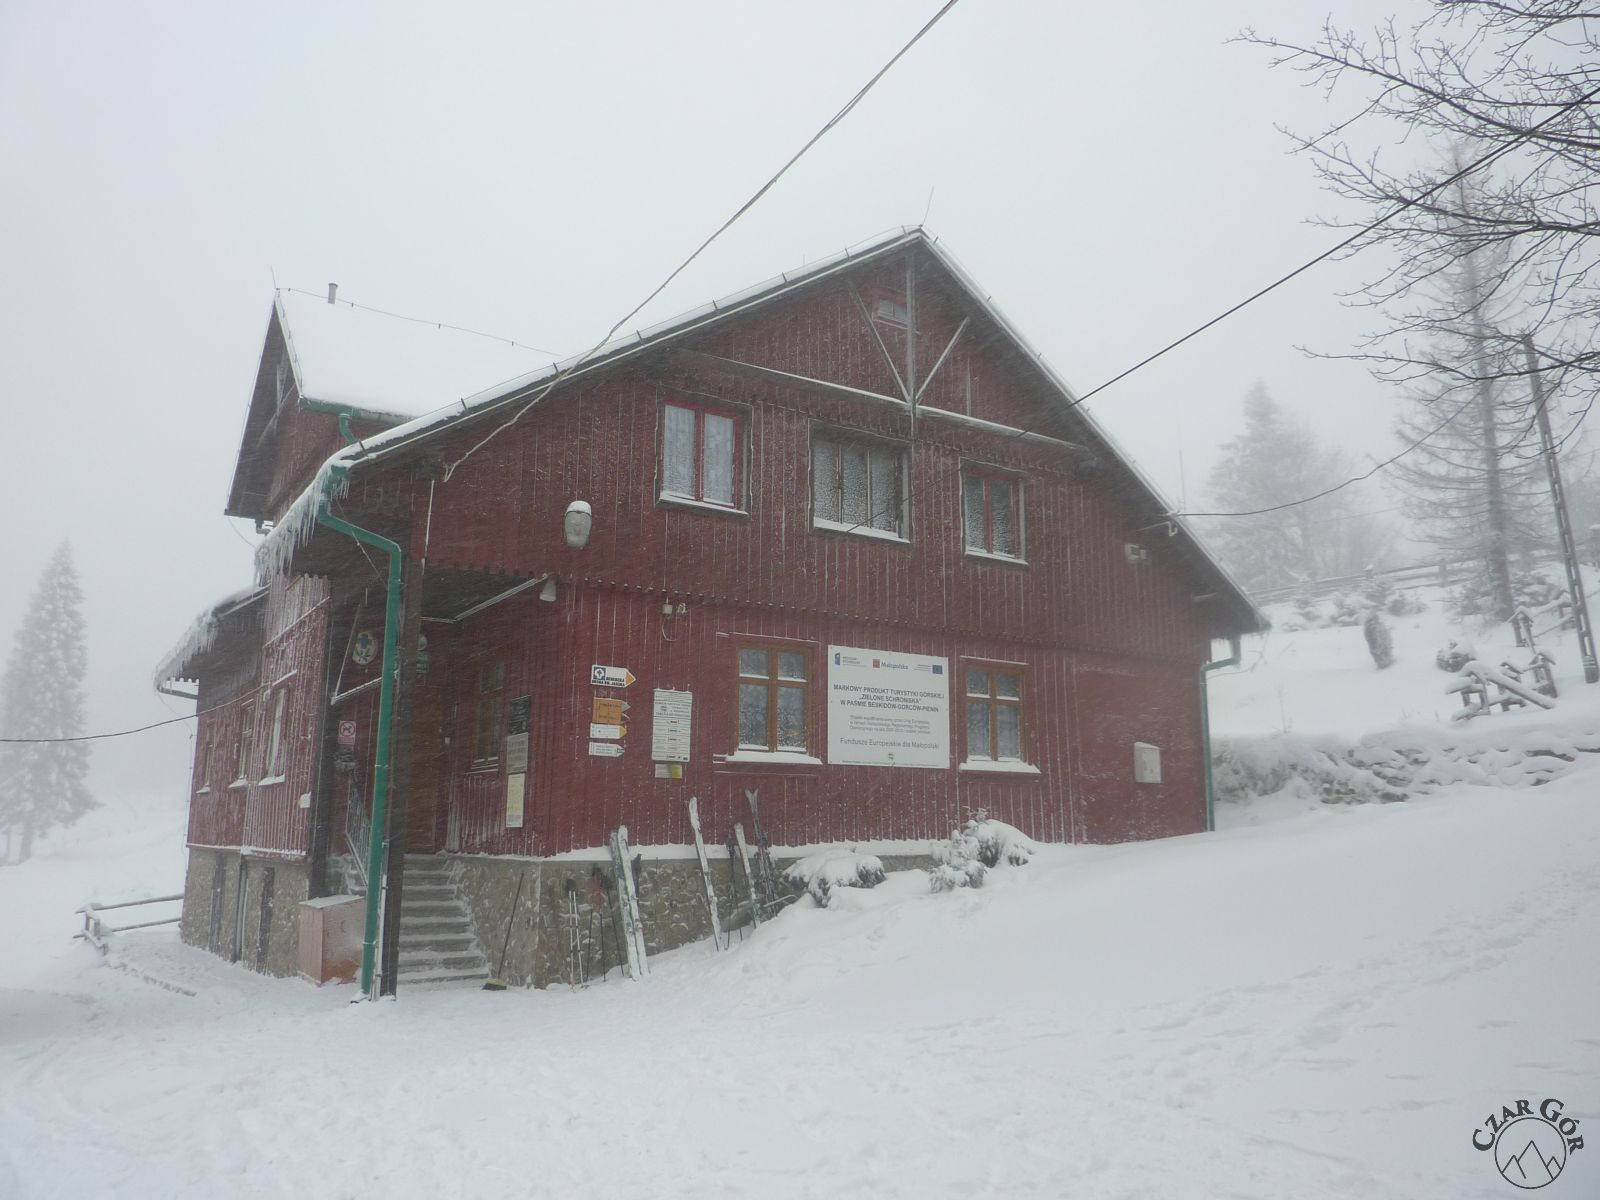 Schronisko PTTK na Leskowcu